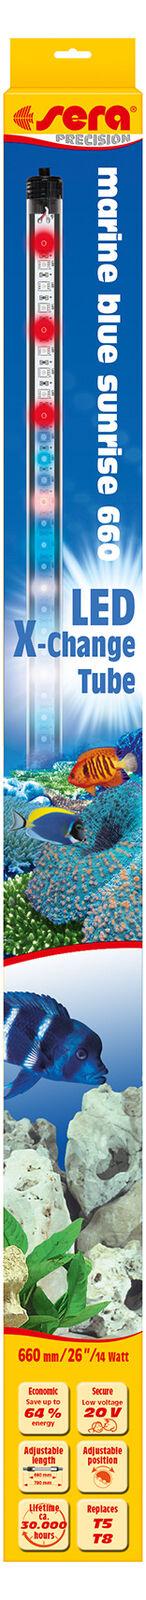 Sieri Sieri Sieri LED X-Change Tube Marine blu Sunrise, 8,6-25 W, Single Pack & 2er sparpack 49dae8